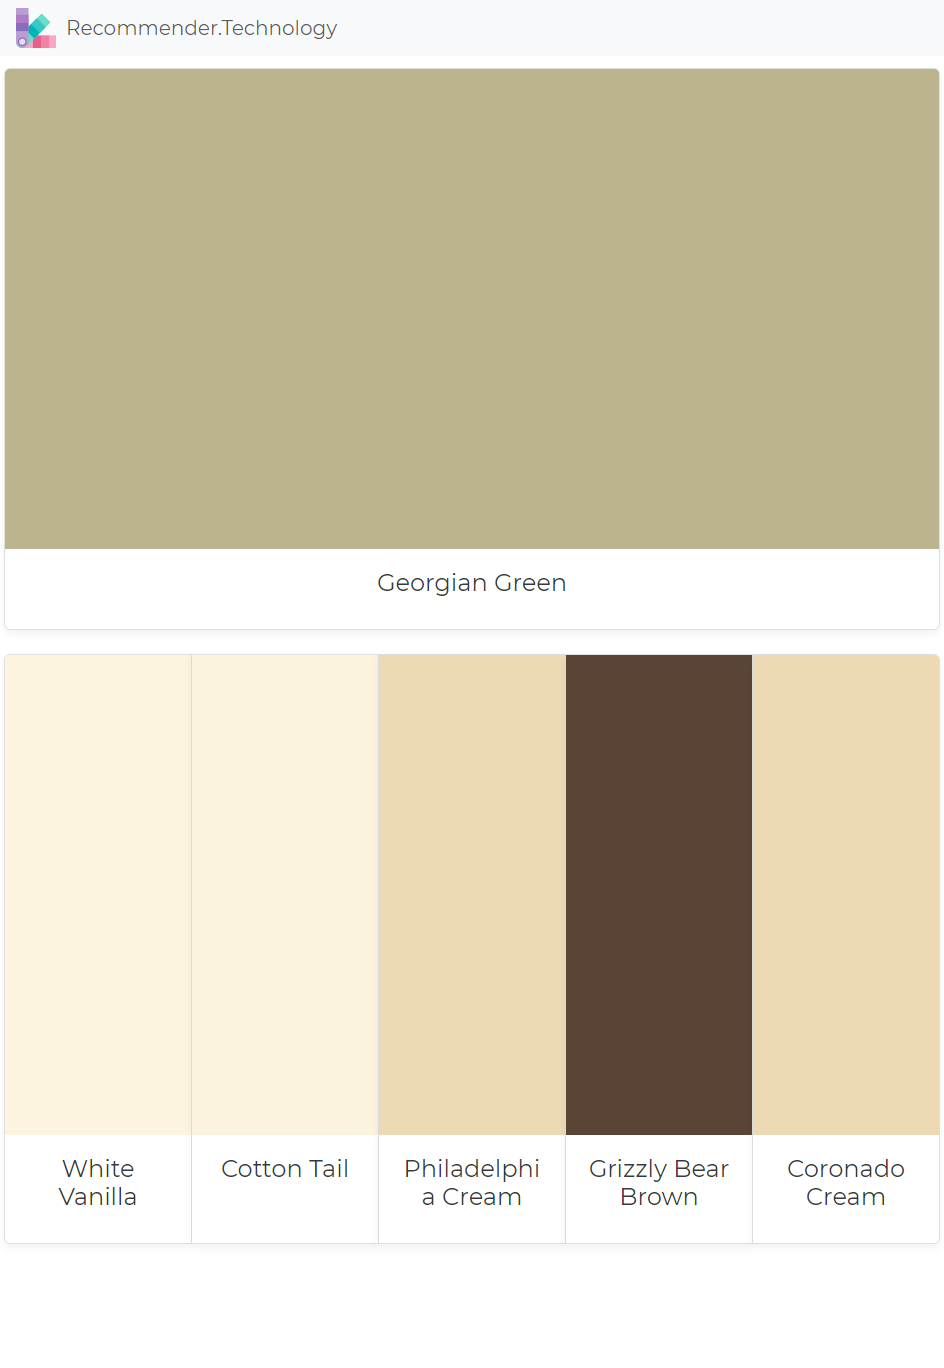 Benjamin Moore Georgian Green georgian green: white vanilla, cotton tail, philadelphia